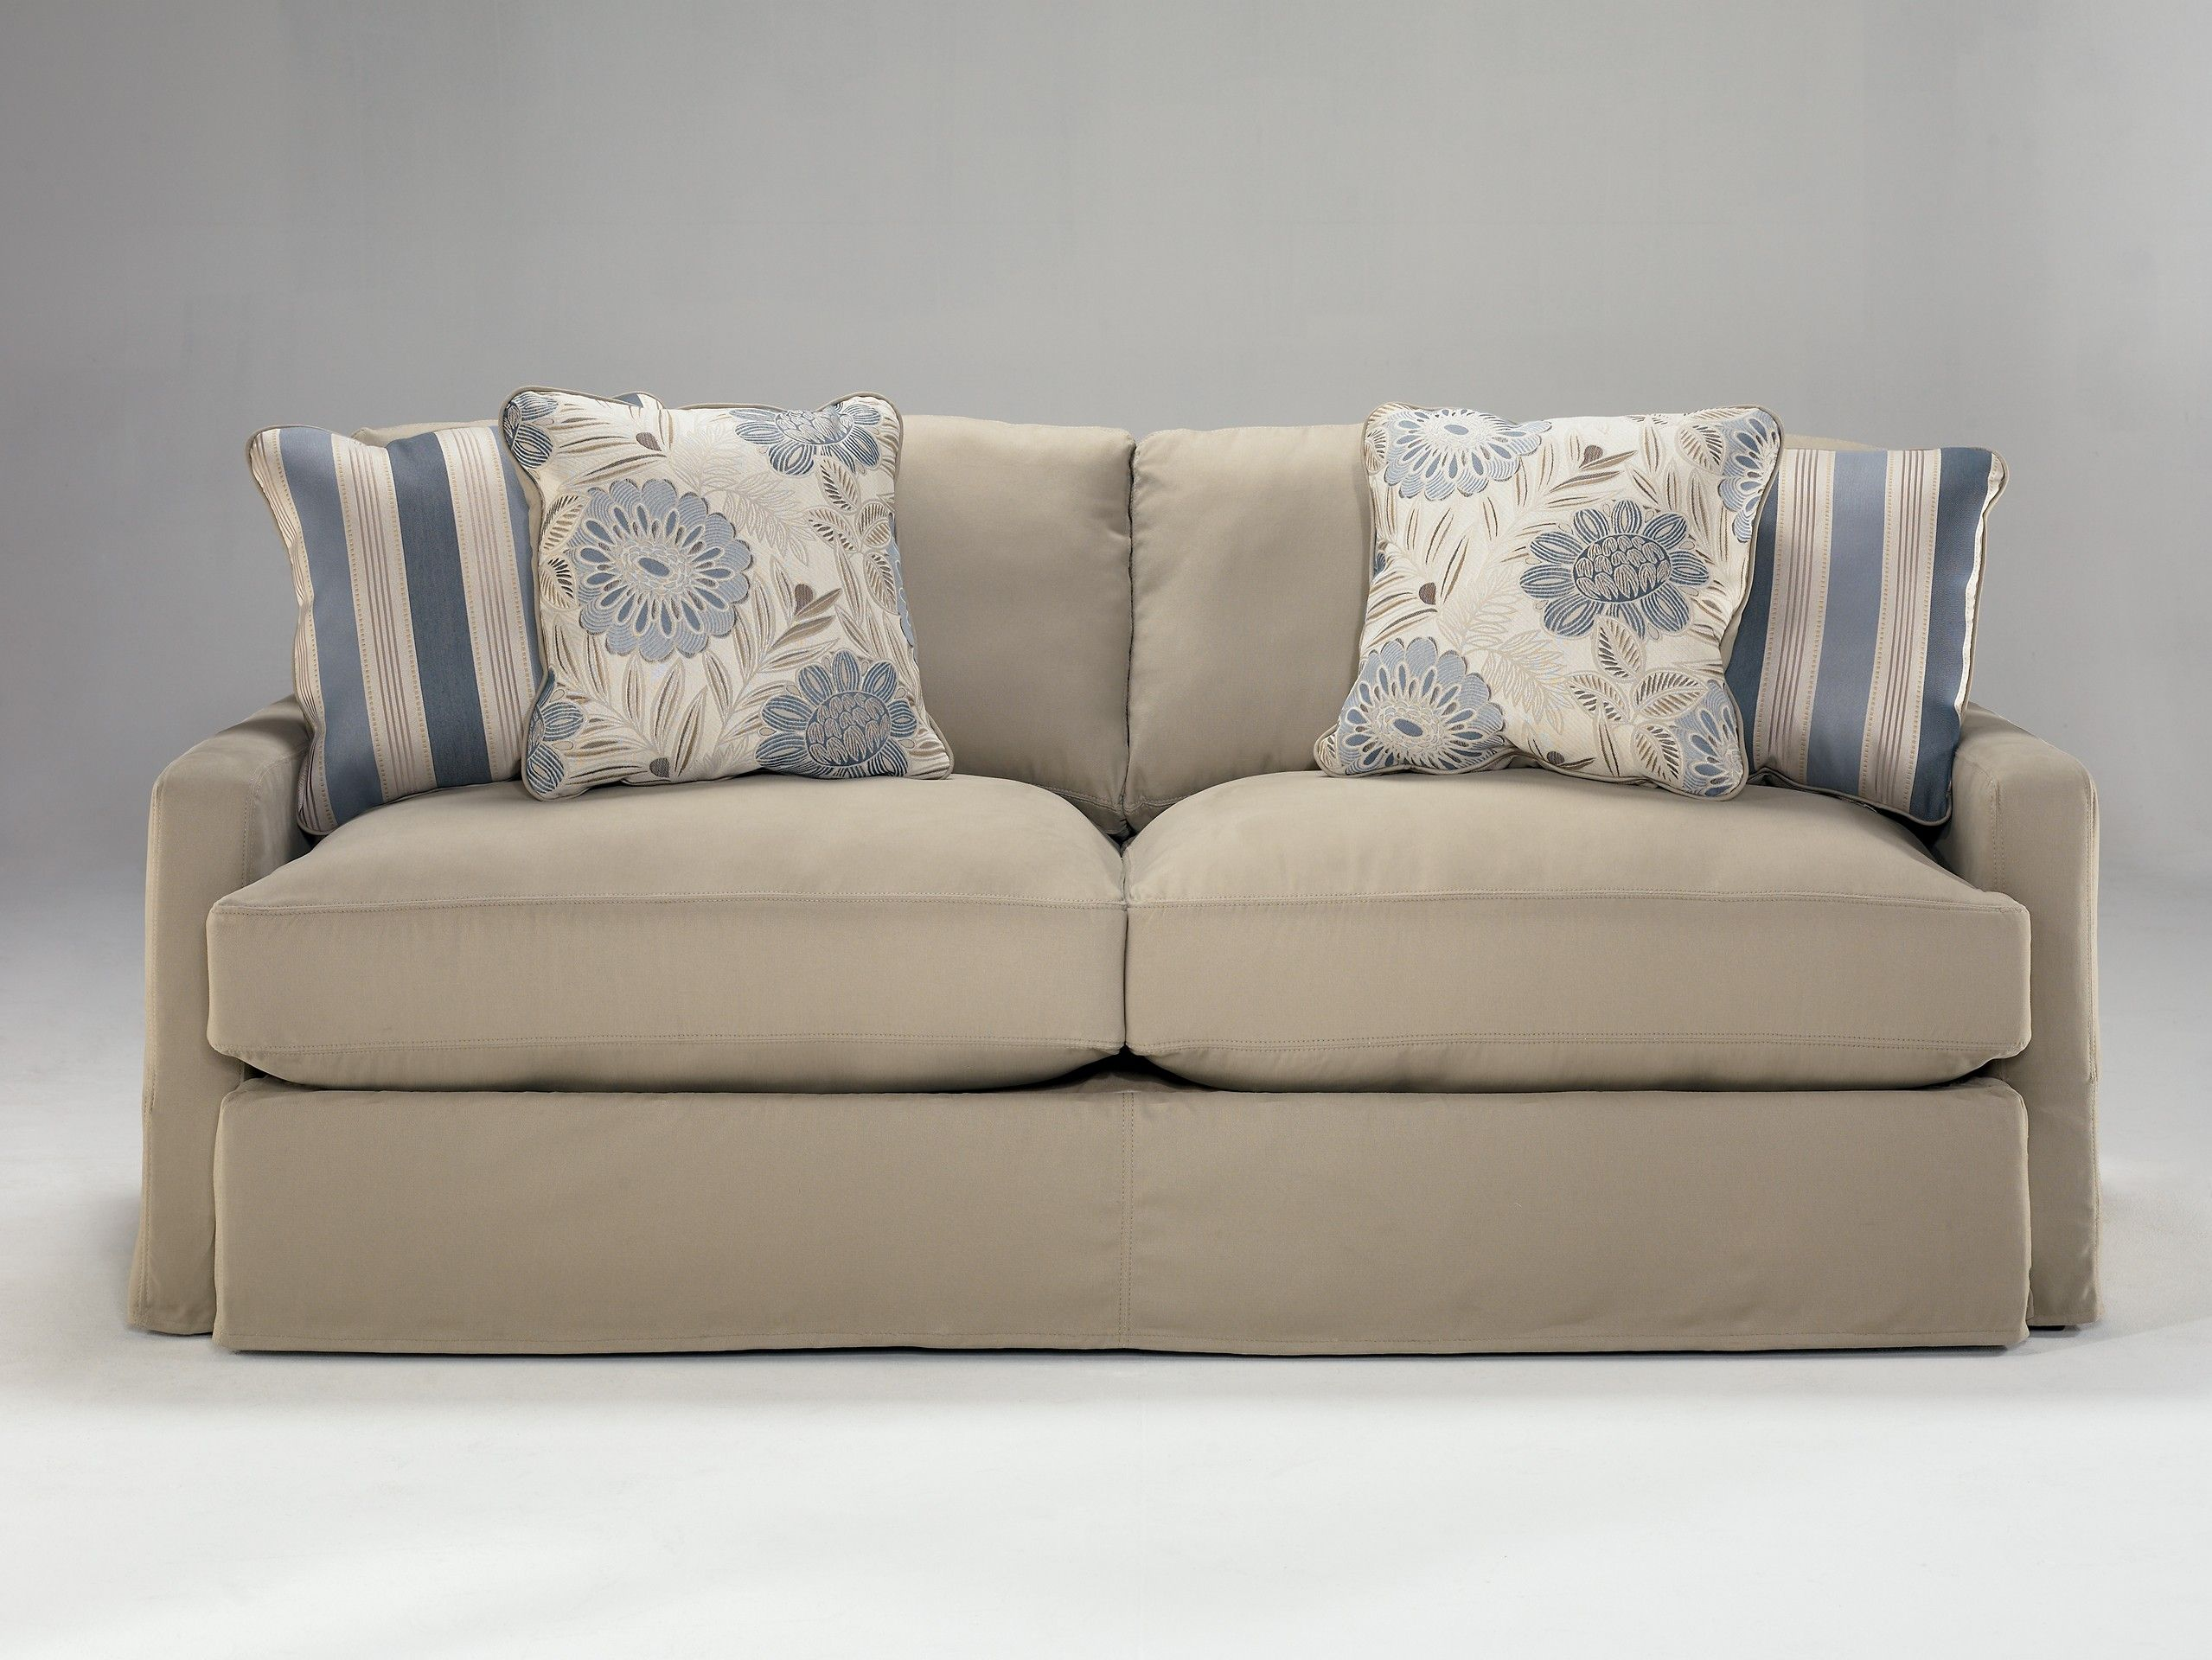 Addison Sofa Ashley Furniture Blue Patterned Sofas 7880038 Signature Design Editor Picks